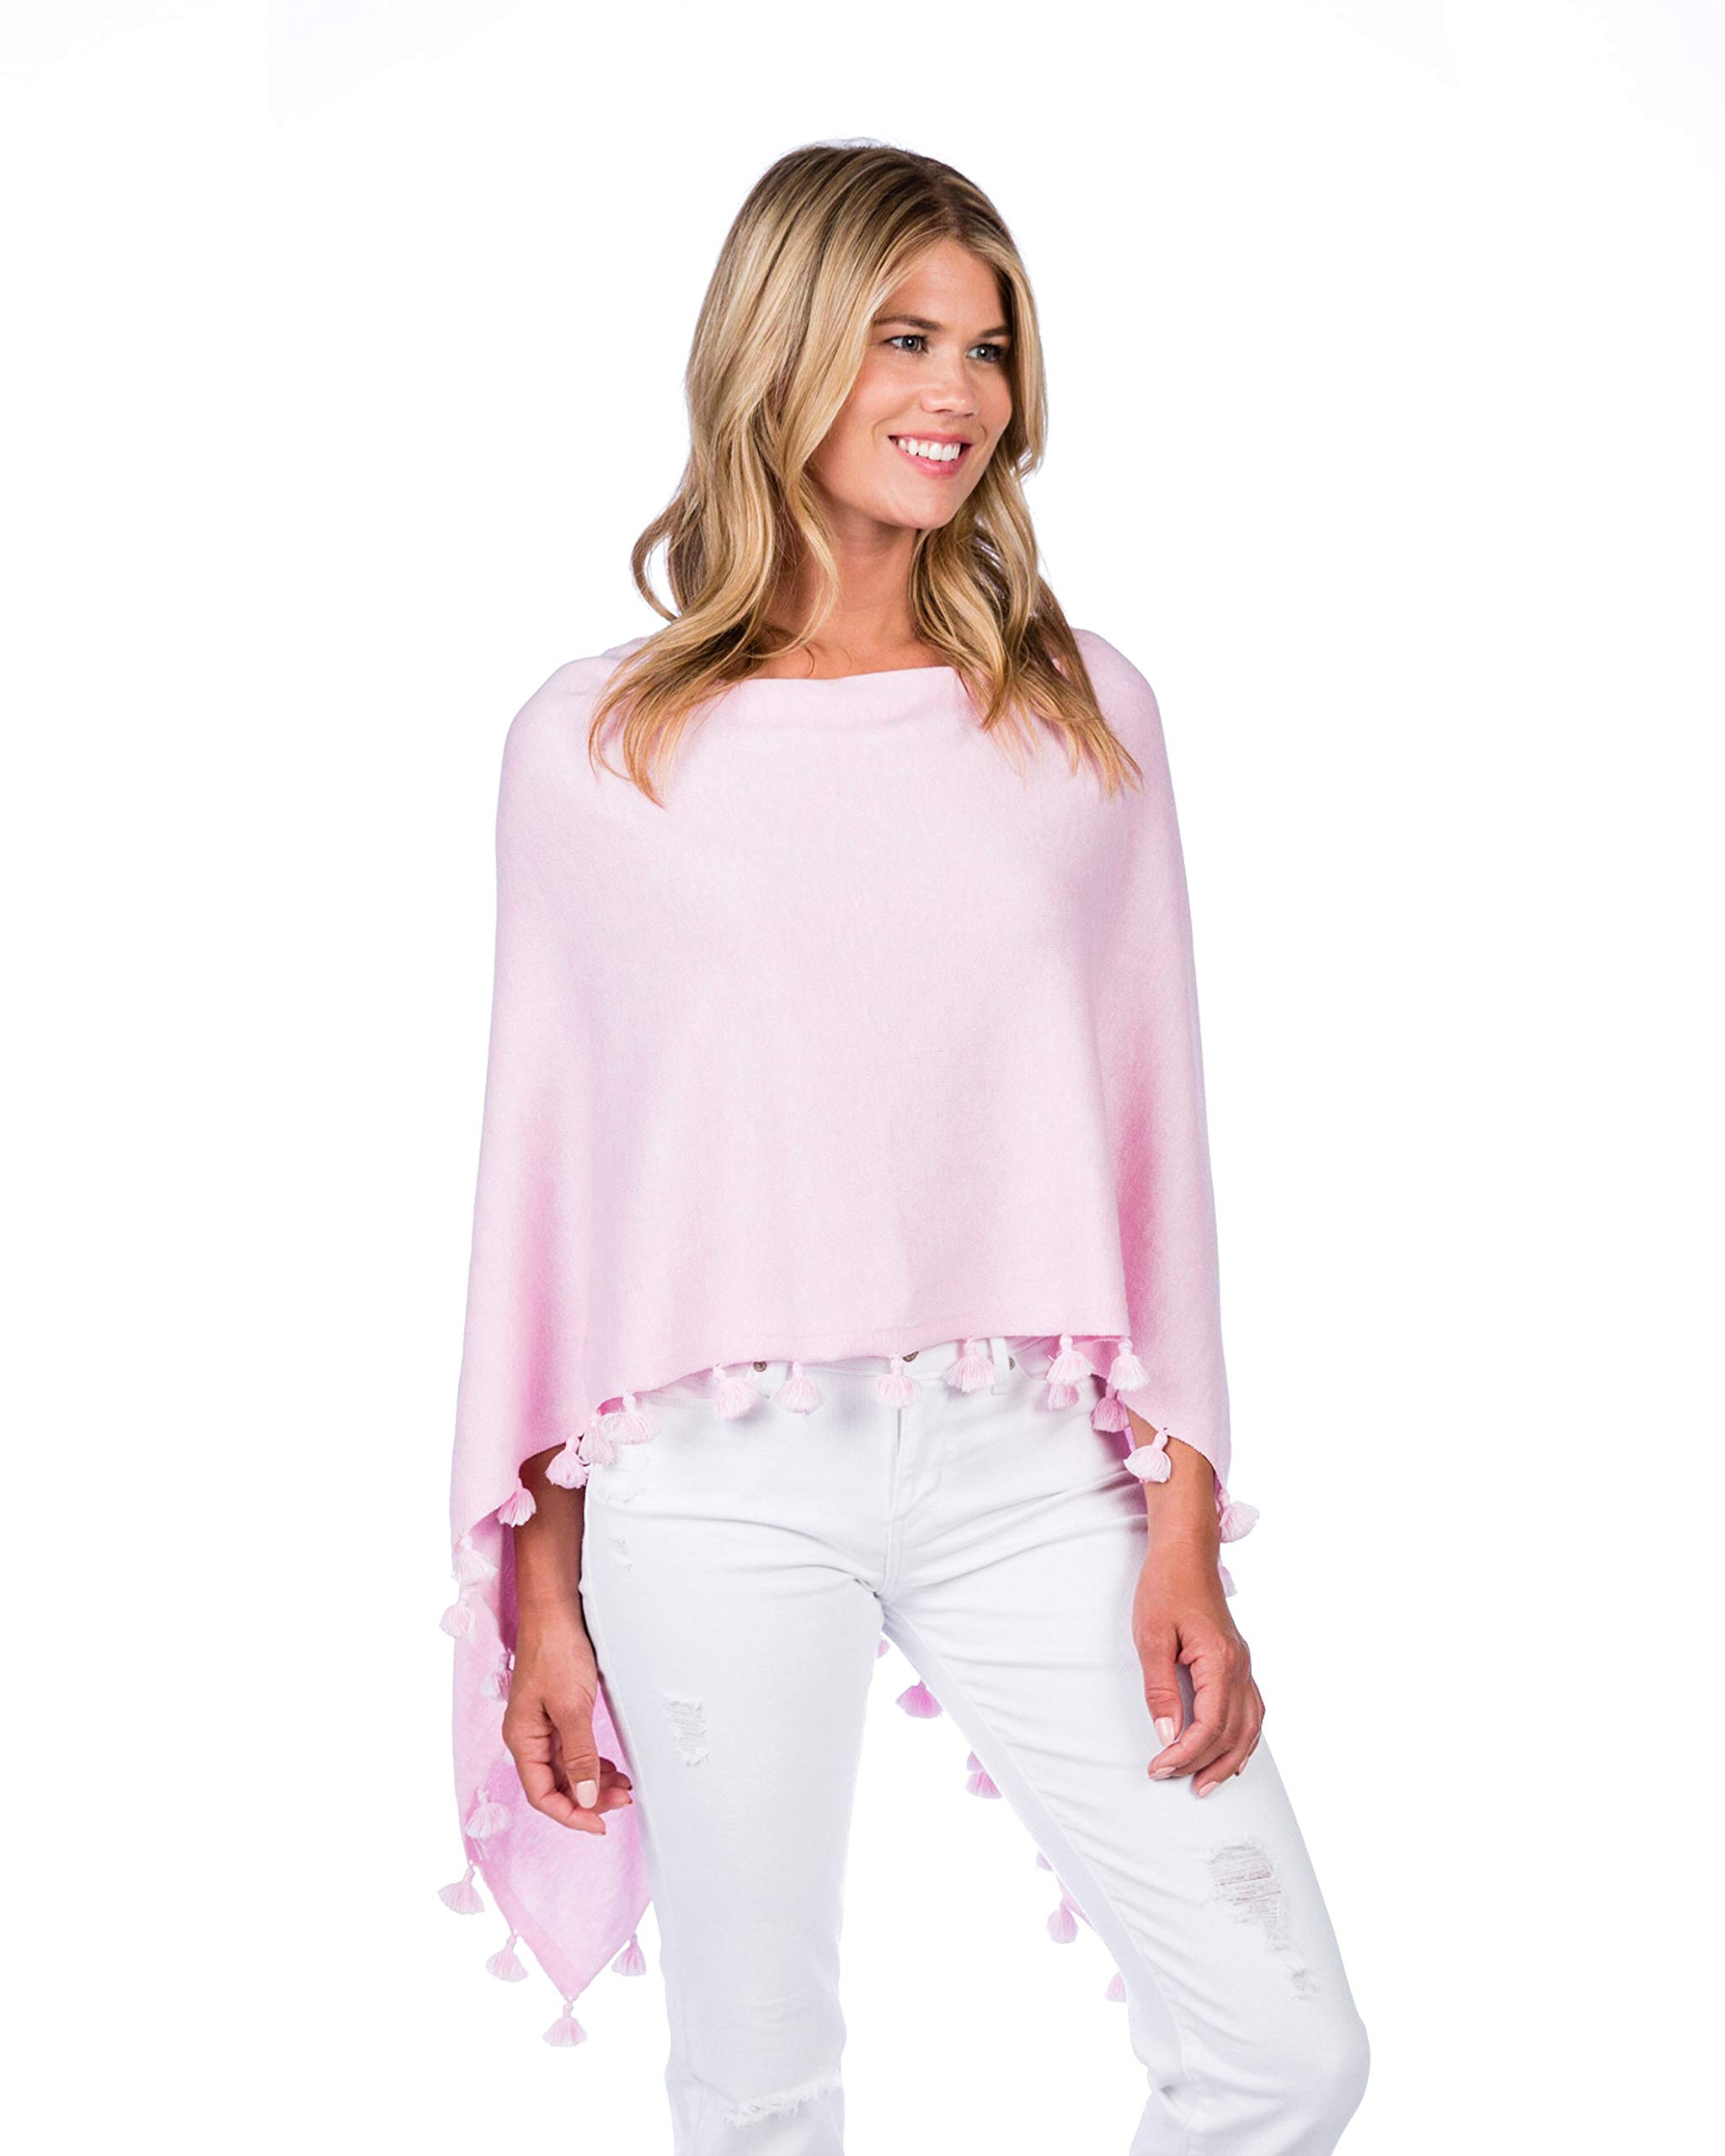 Caroline Grace by Alashan Cashmere Blend Tassel Trim Dress Topper - Bermuda Pink